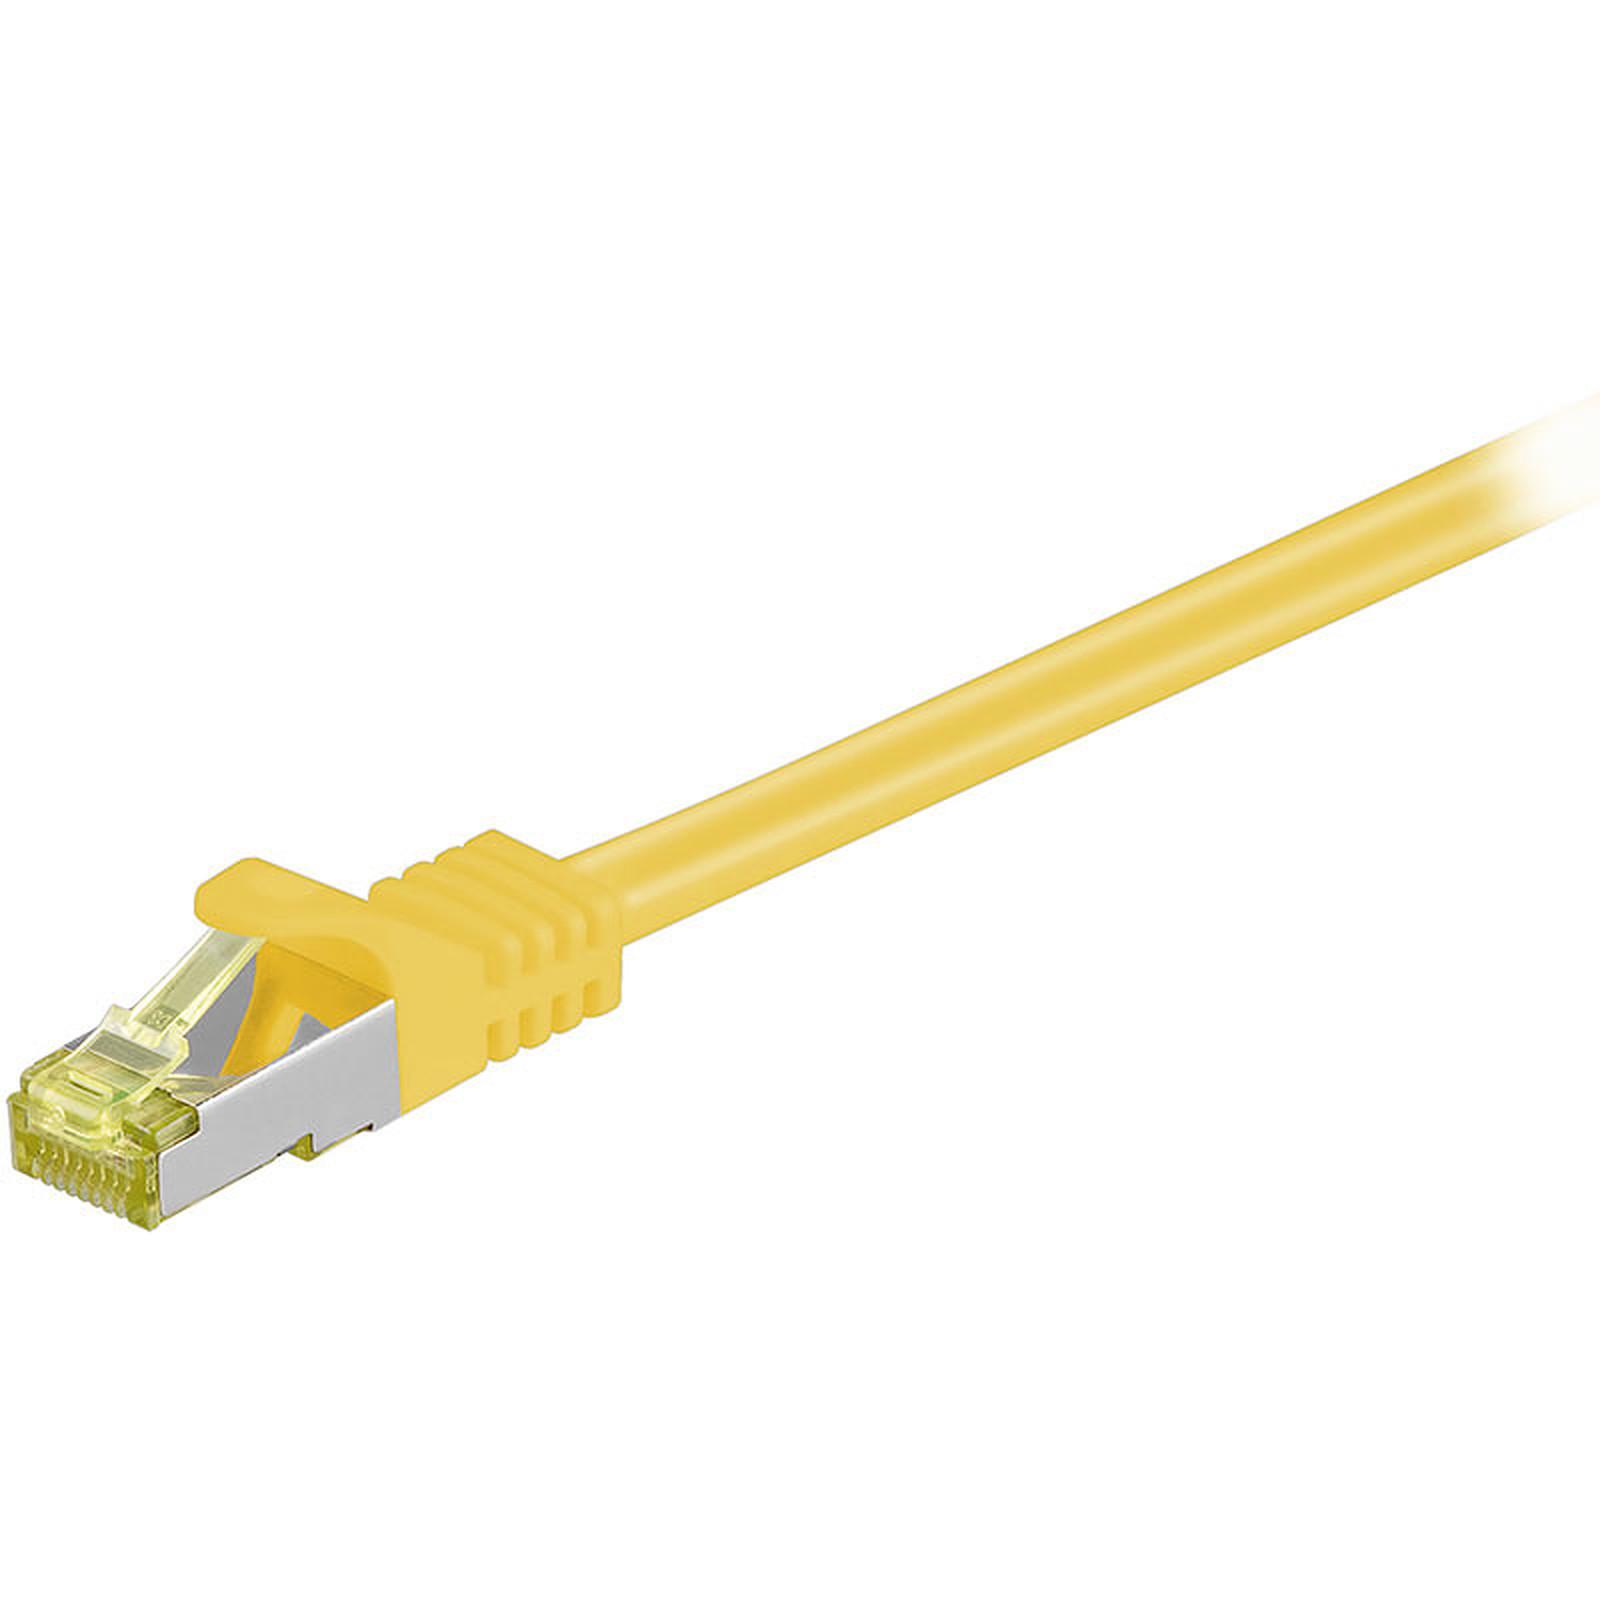 Cable RJ45 categoría 7 S/FTP 5 m (amarillo)